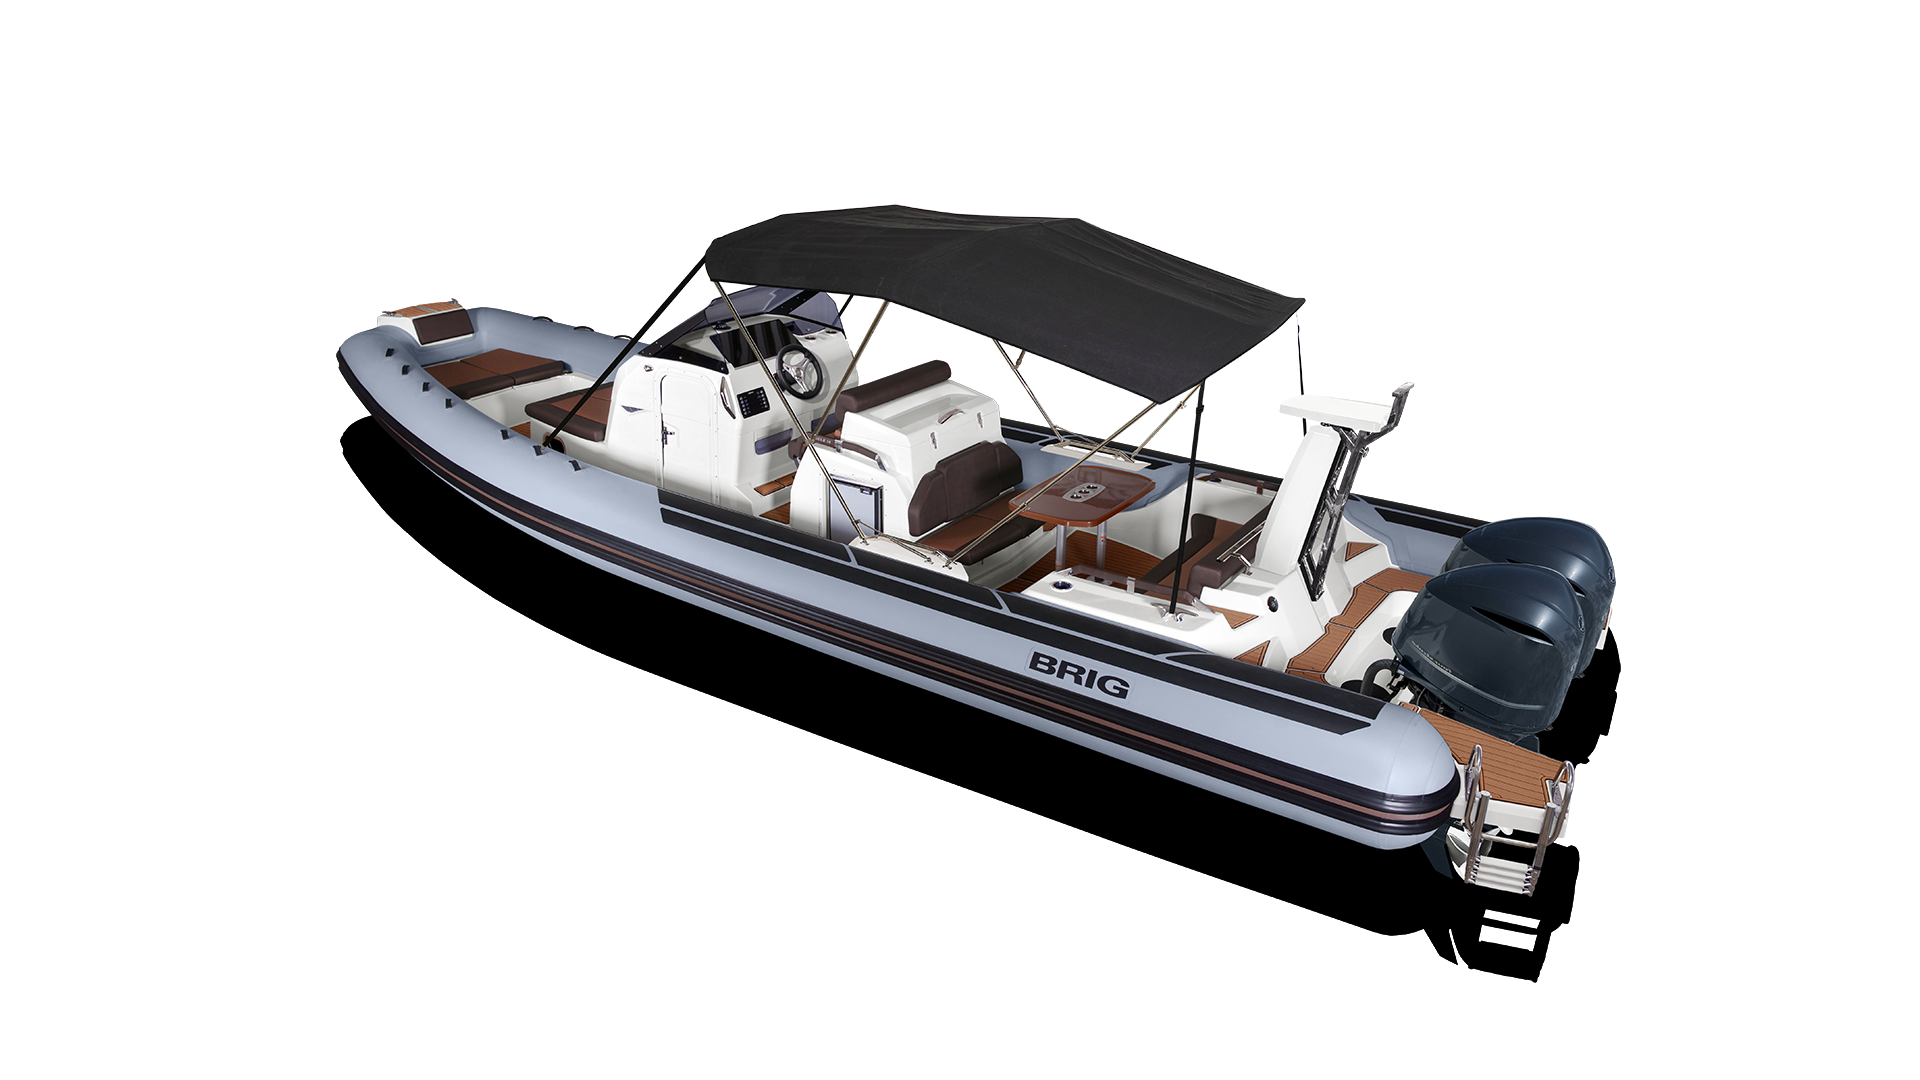 Stainless Steel BOAT LADDER Speedboat Rib Inflatable Swim Bathing Tube Folding